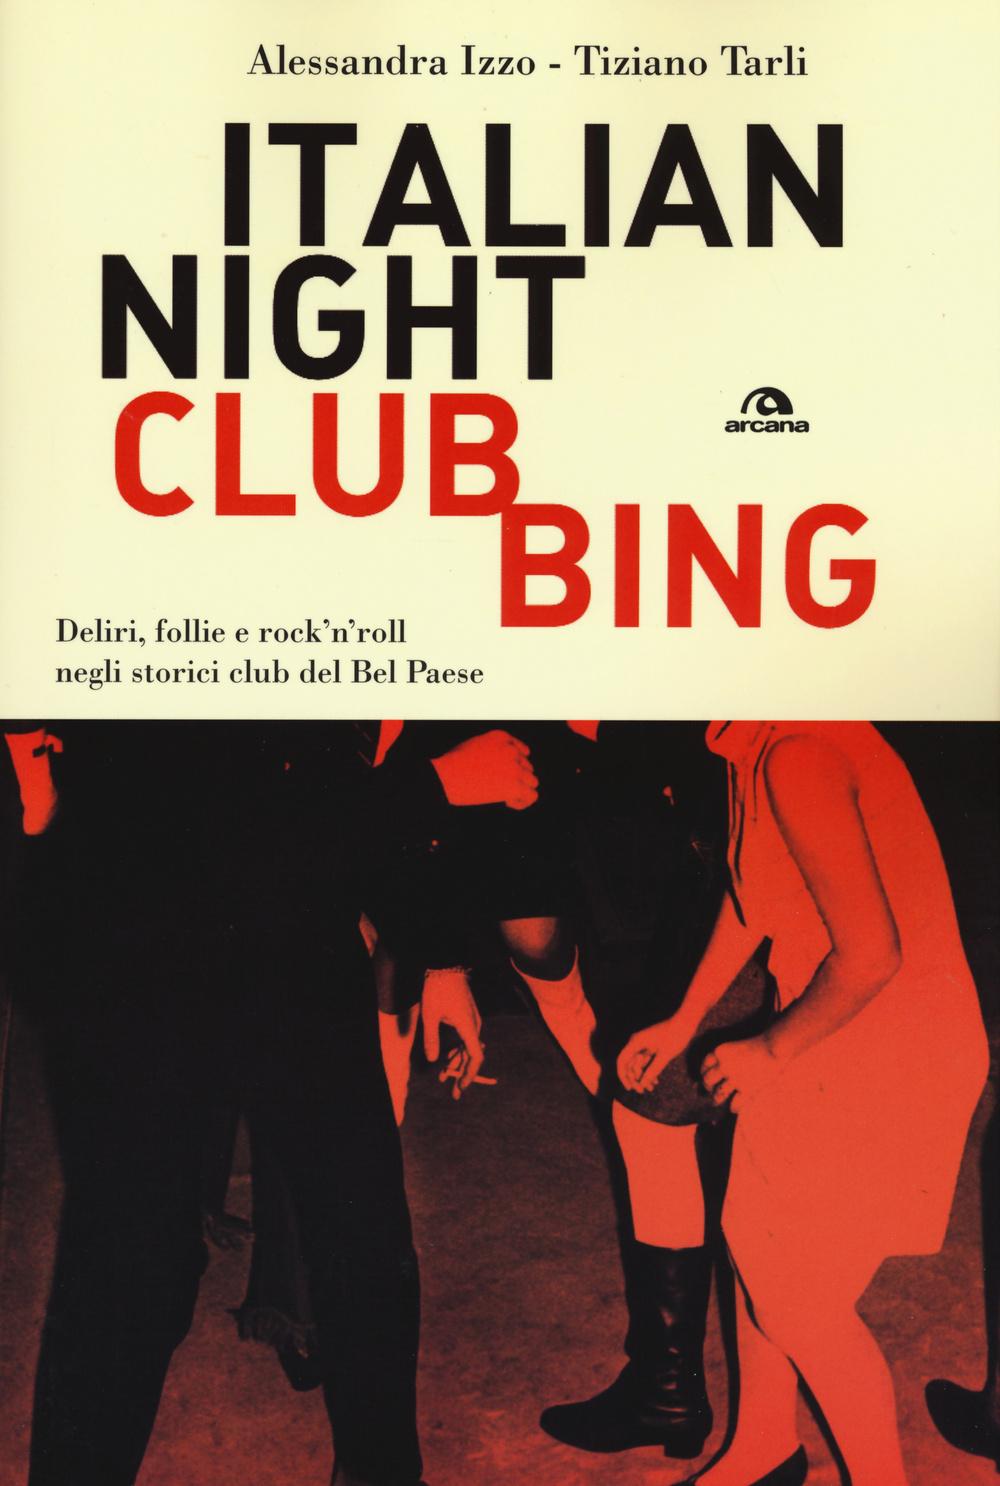 ITALIAN NIGHTCLUBBING. DELIRI, FOLLIE E ROCK'N'ROLL NEGLI STORICI CLUB DEL BEL PAESE - 9788862318273